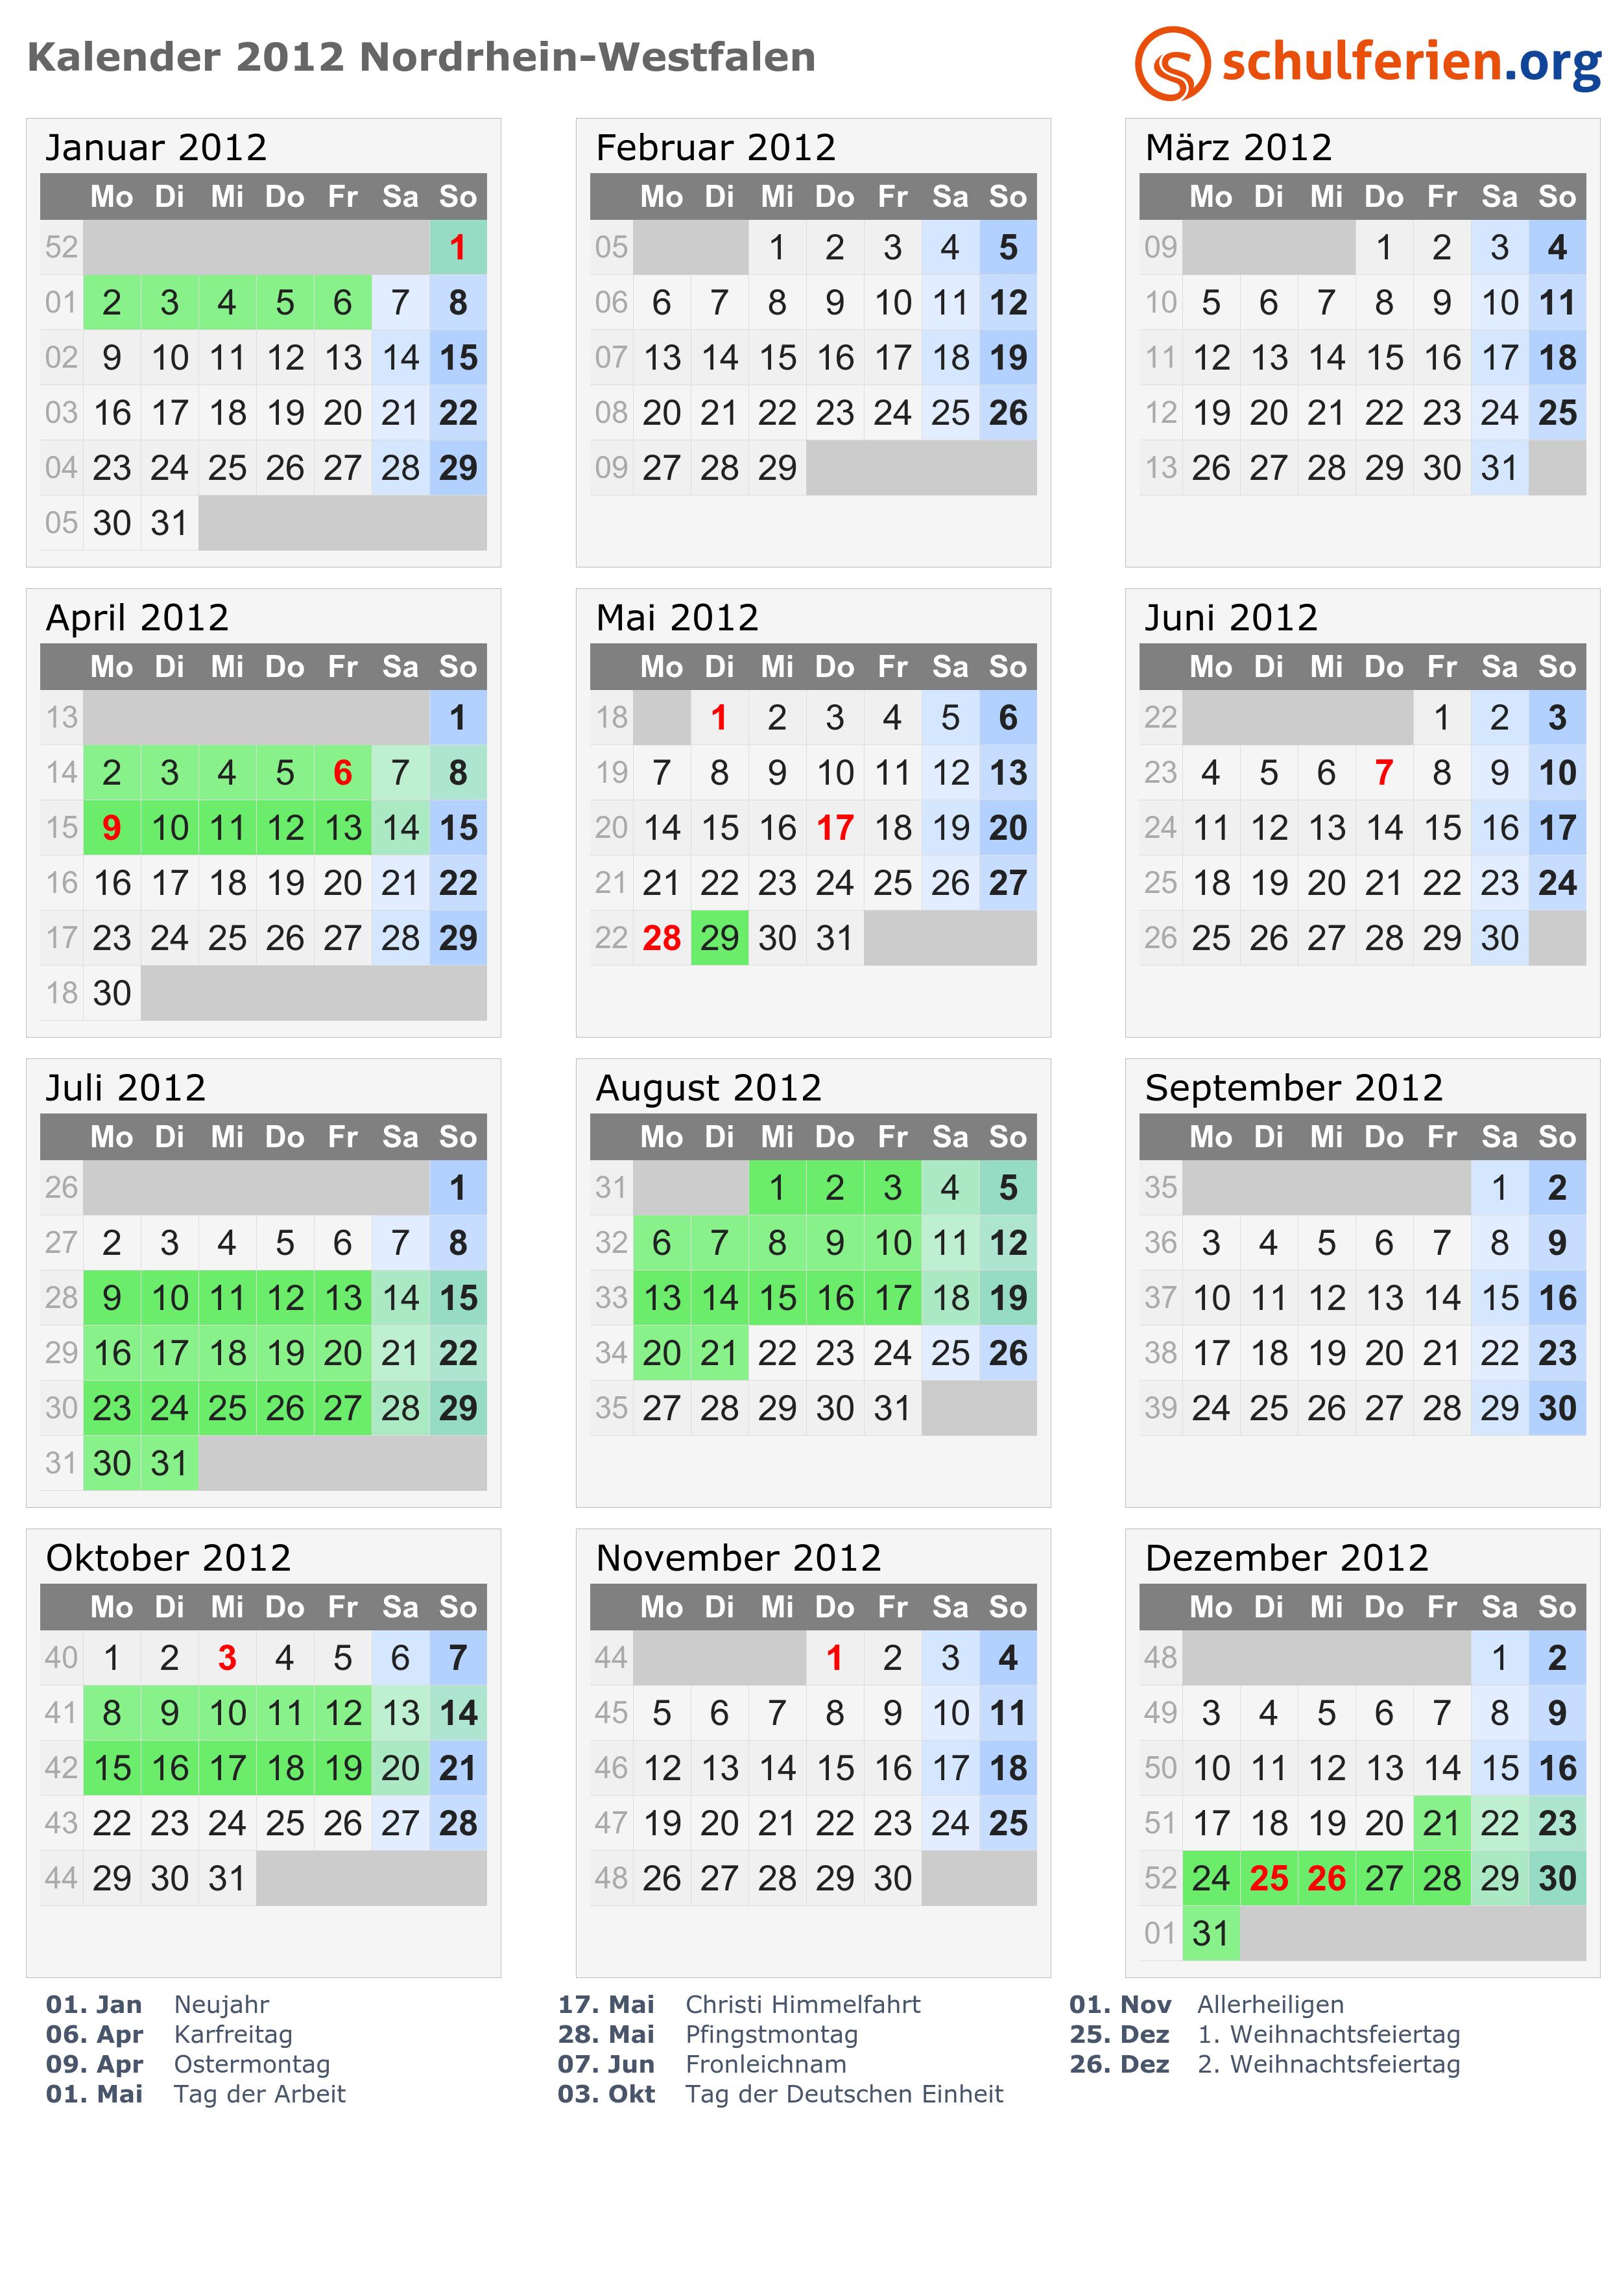 ostern 2012 kalender